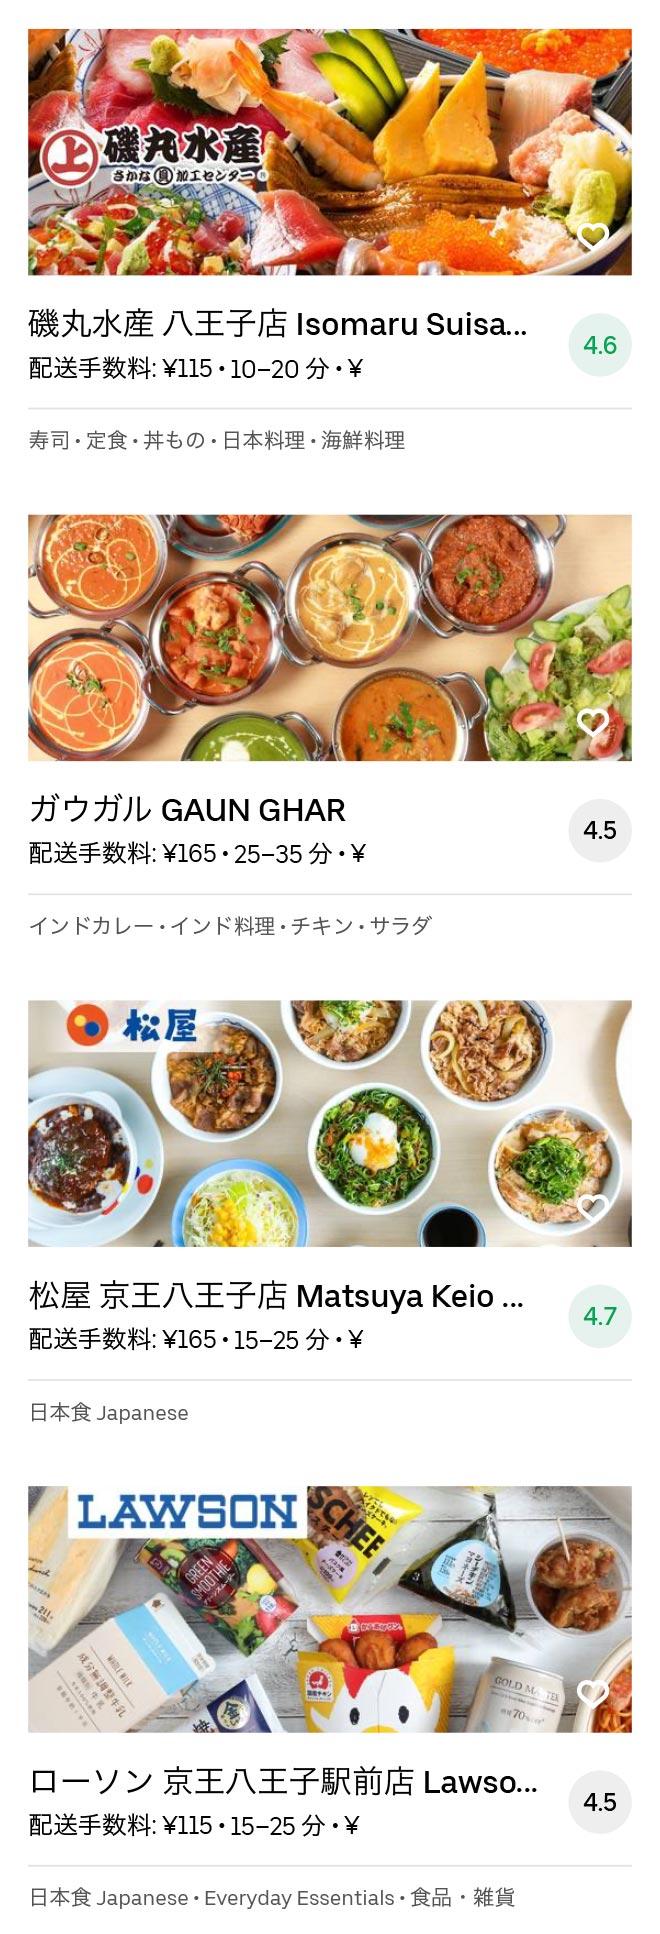 Hatioji menu 2010 11